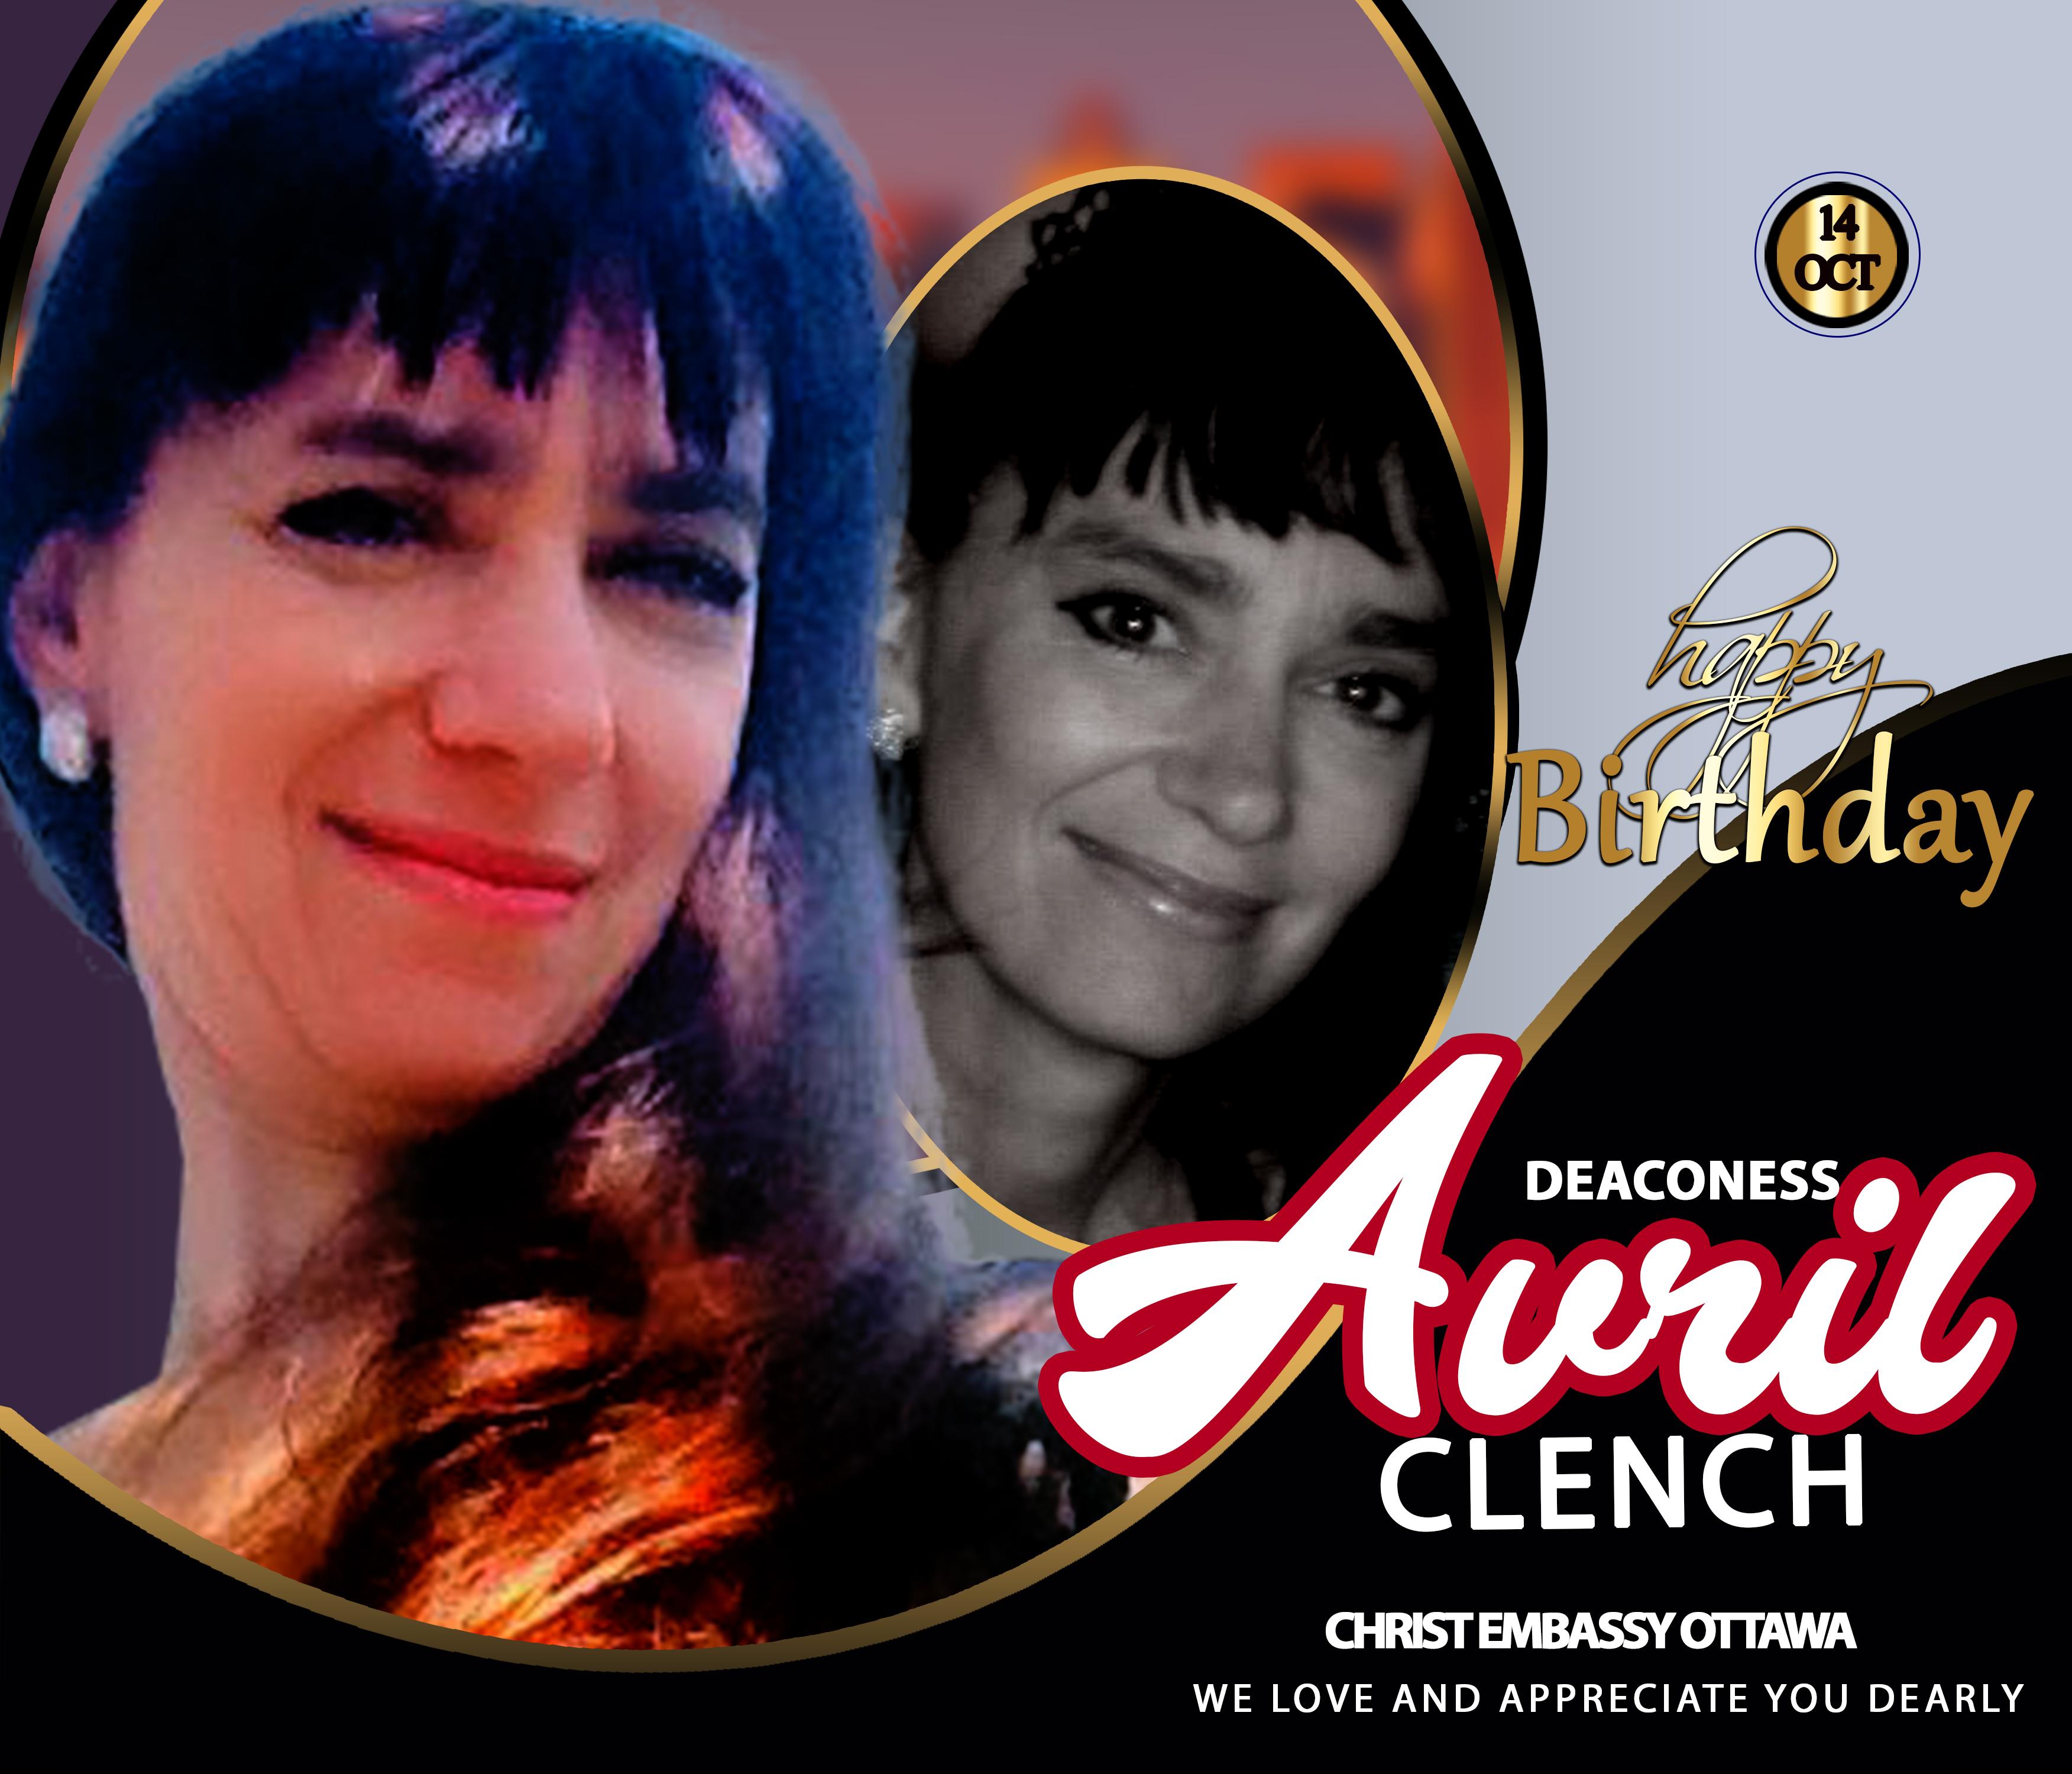 Happy Birthday dear Deaconess Avril.